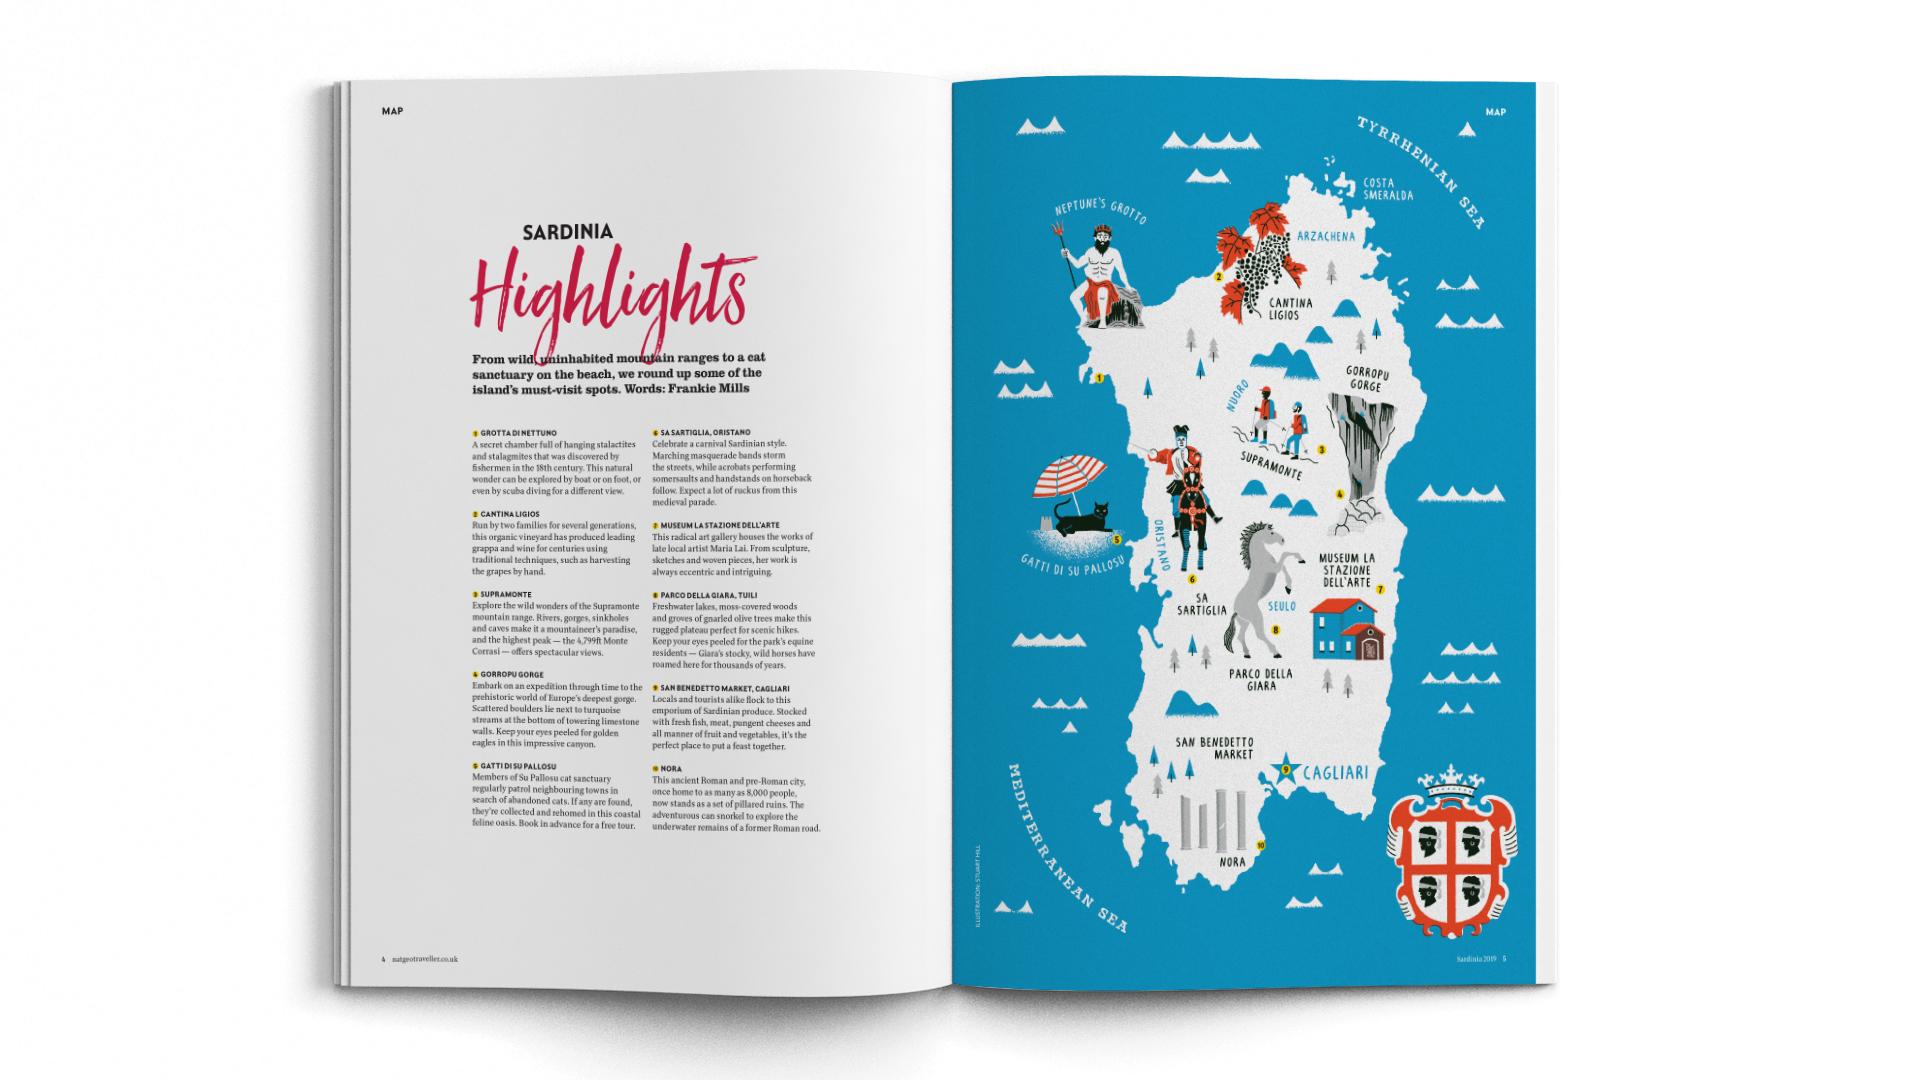 A4-Magazine-DPS-NGT-SARDINIA-Highlights